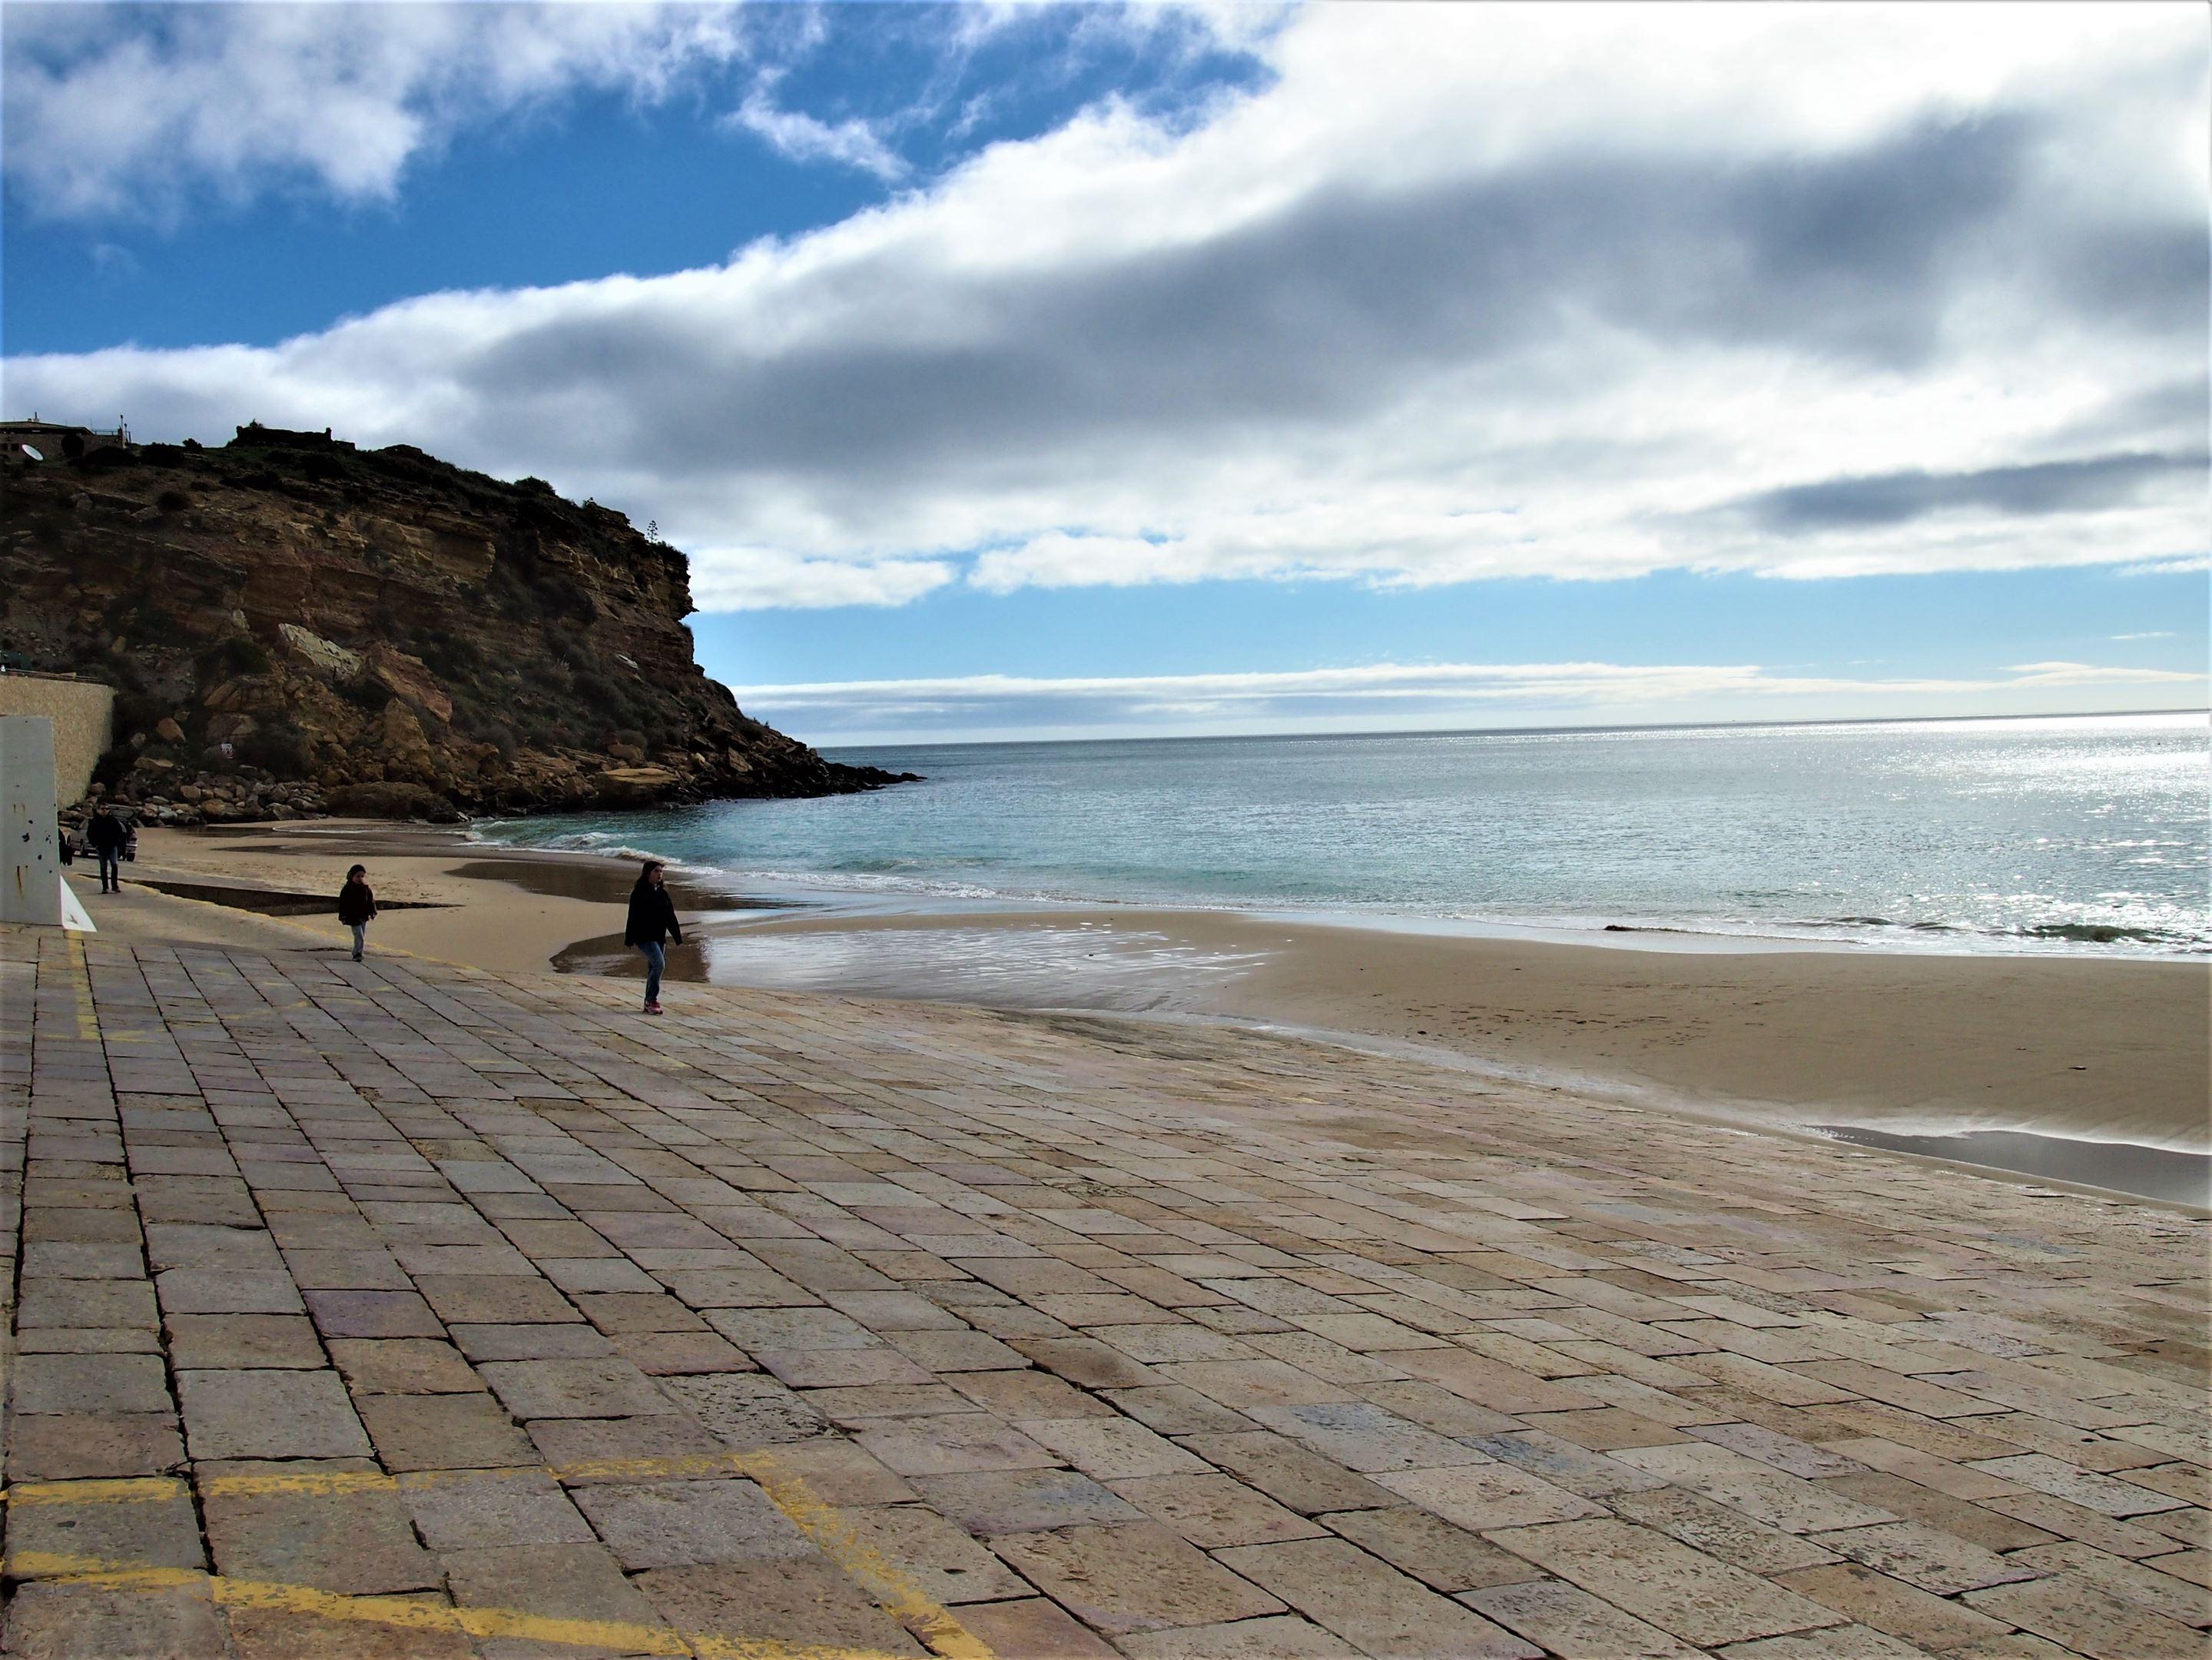 Praia de Burgau in the Vila do Bispo region